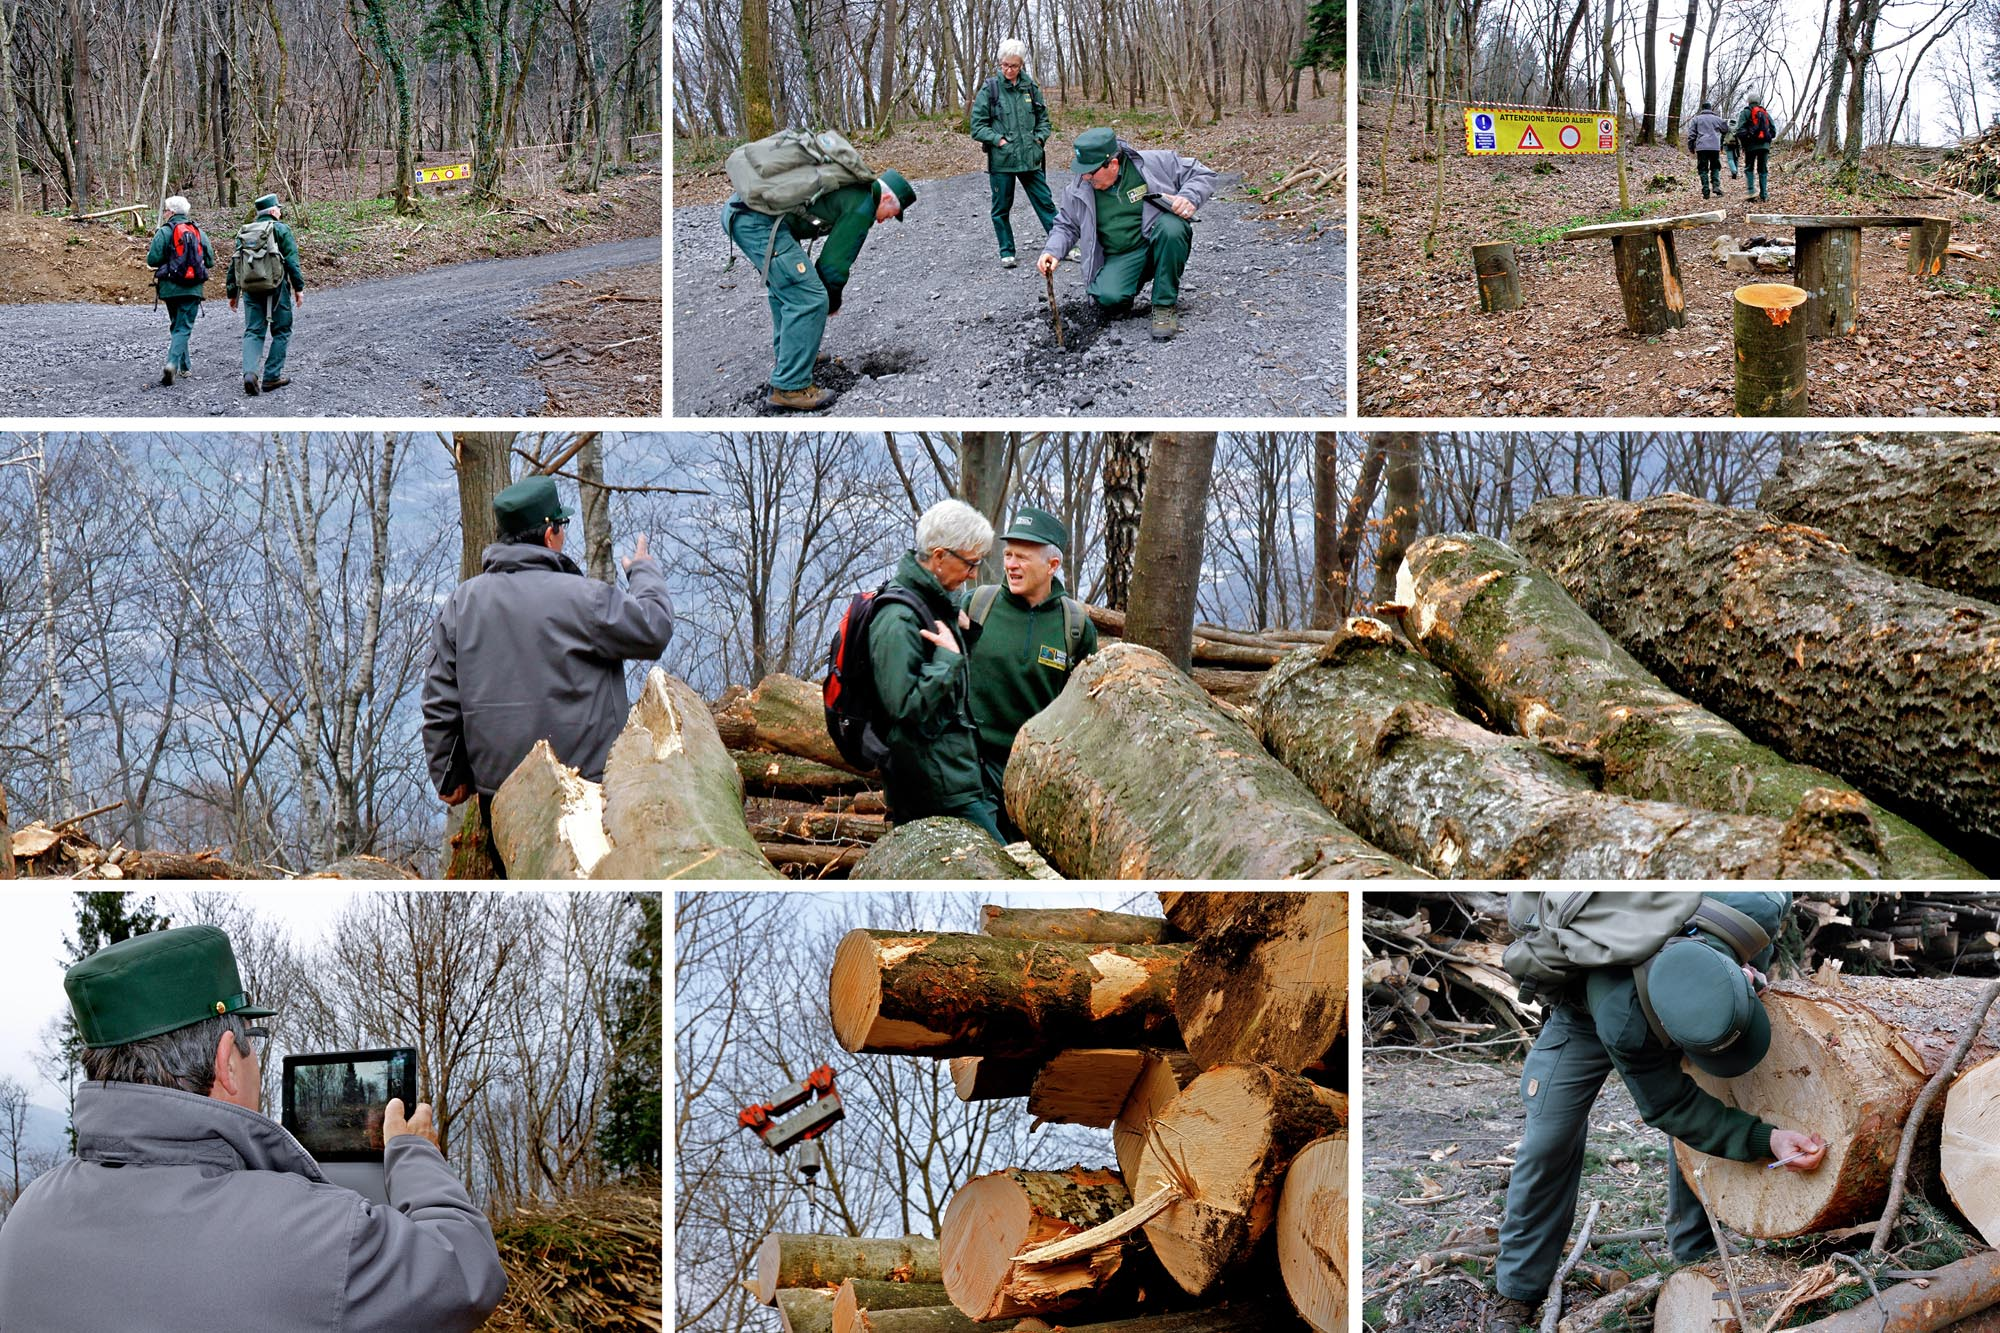 0146 guardie ecologiche volontarie 3 - G.E.V. Guardie Ecologiche Volontarie